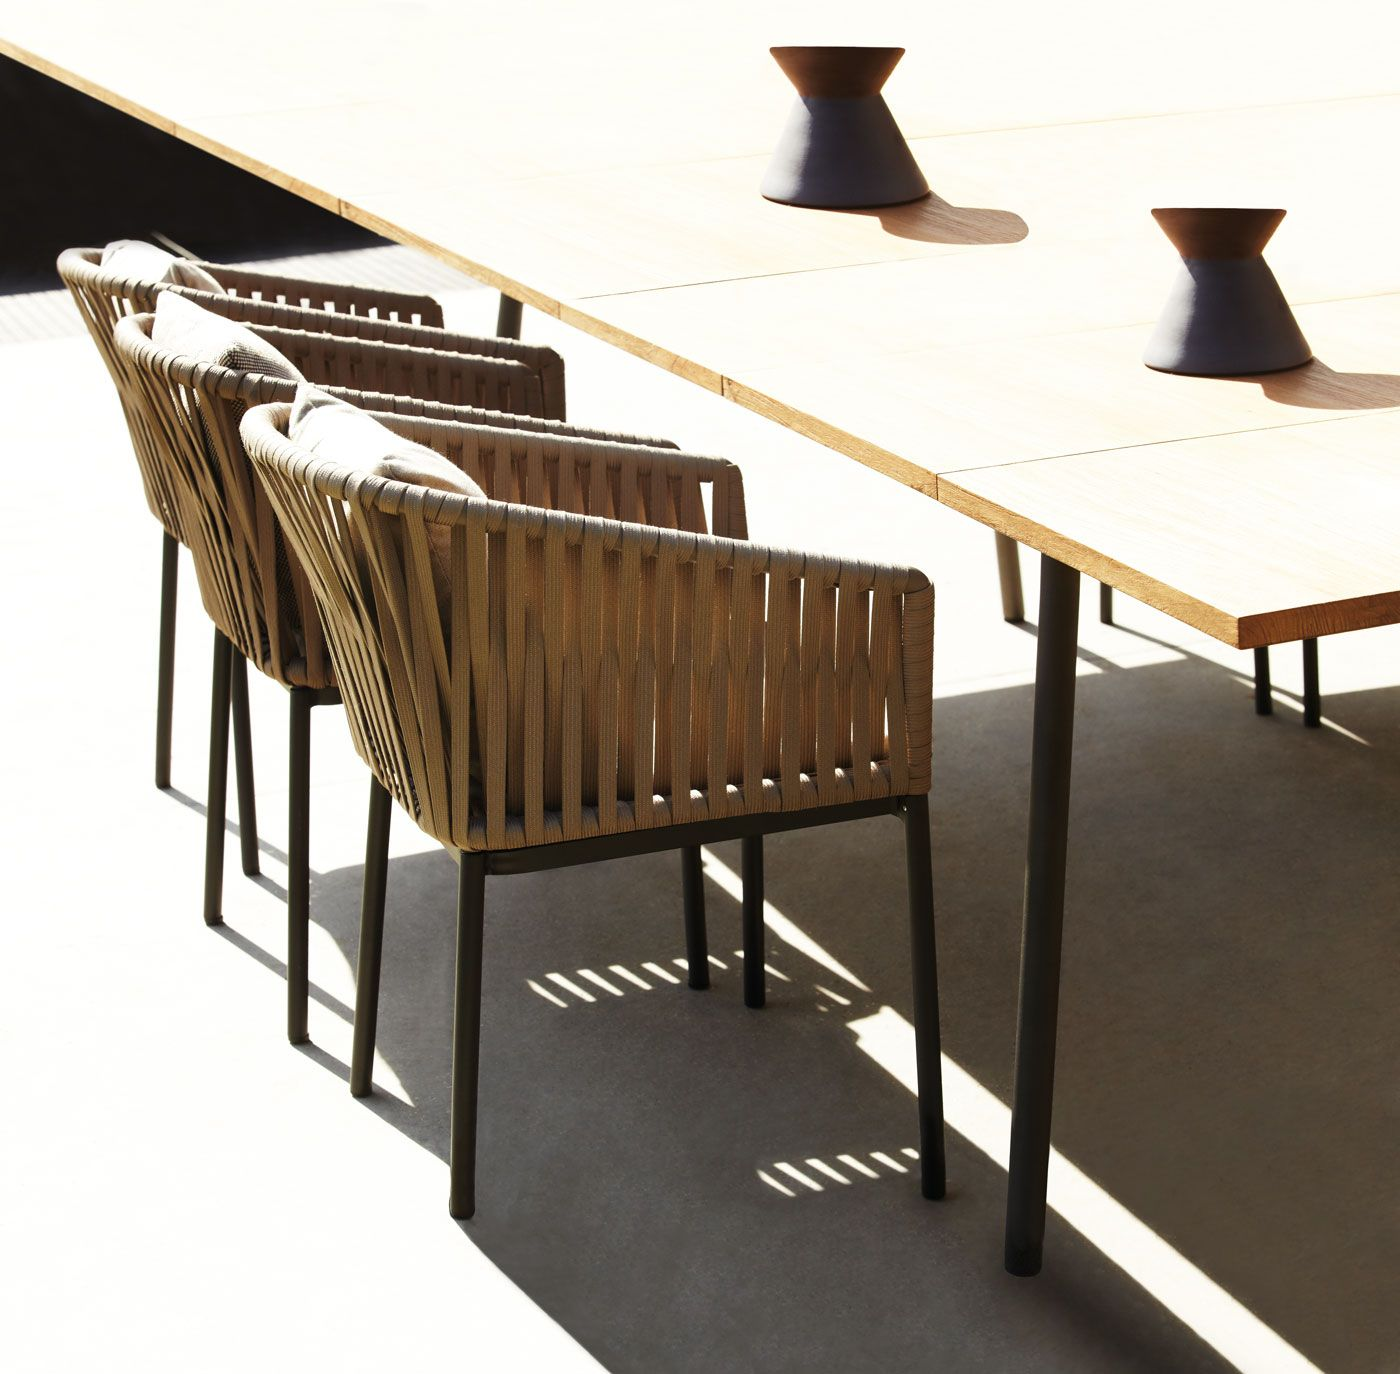 Bitta modern patio furniture by rodolfo dordoni - Kettal Bitta Www Kettal Es Phtml Includes